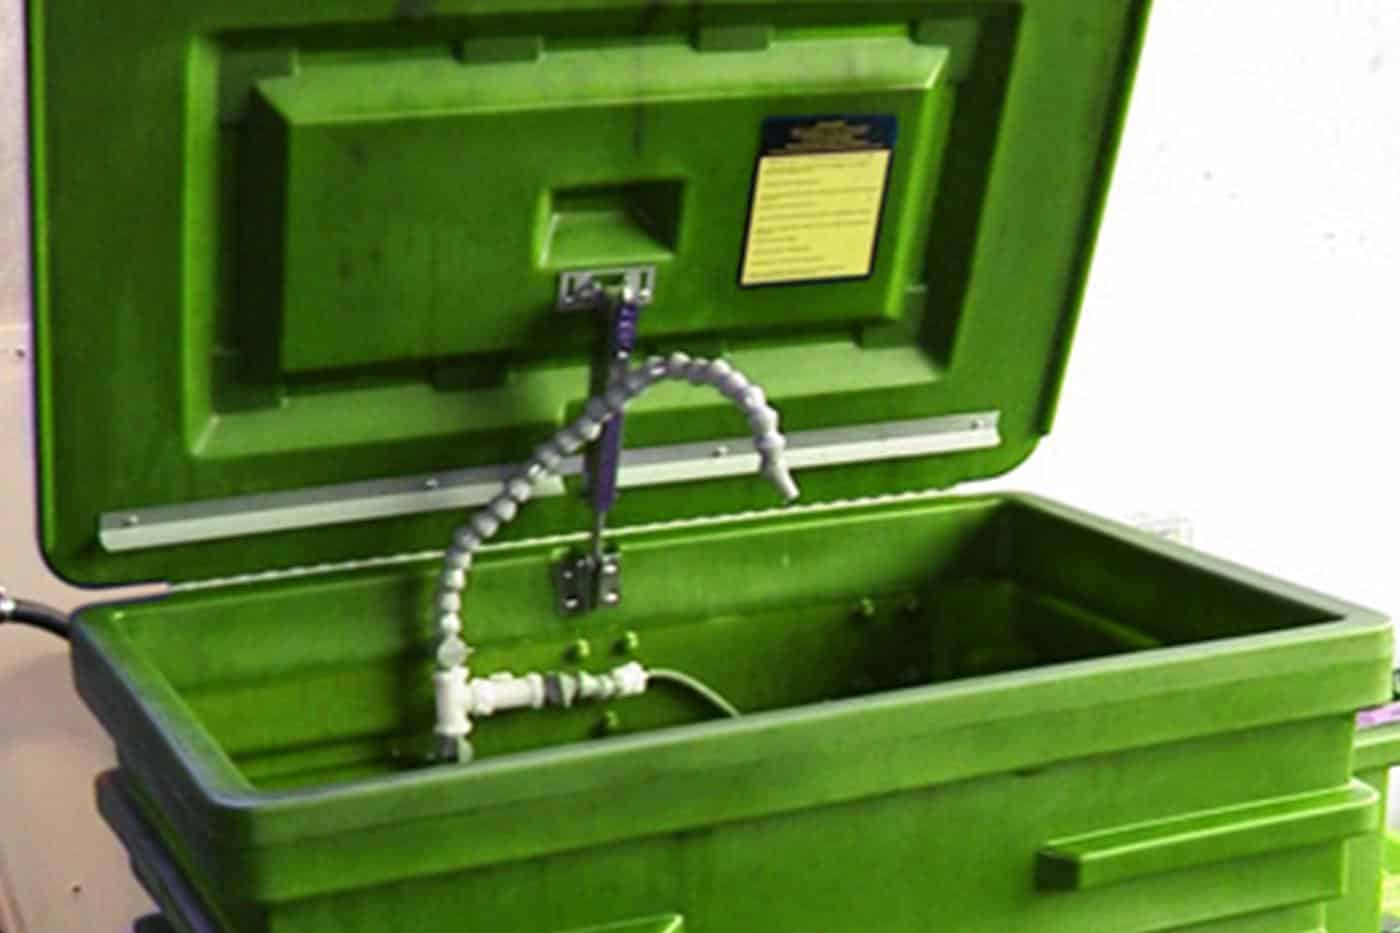 fontaine de nettoyage 4000 - situation 1